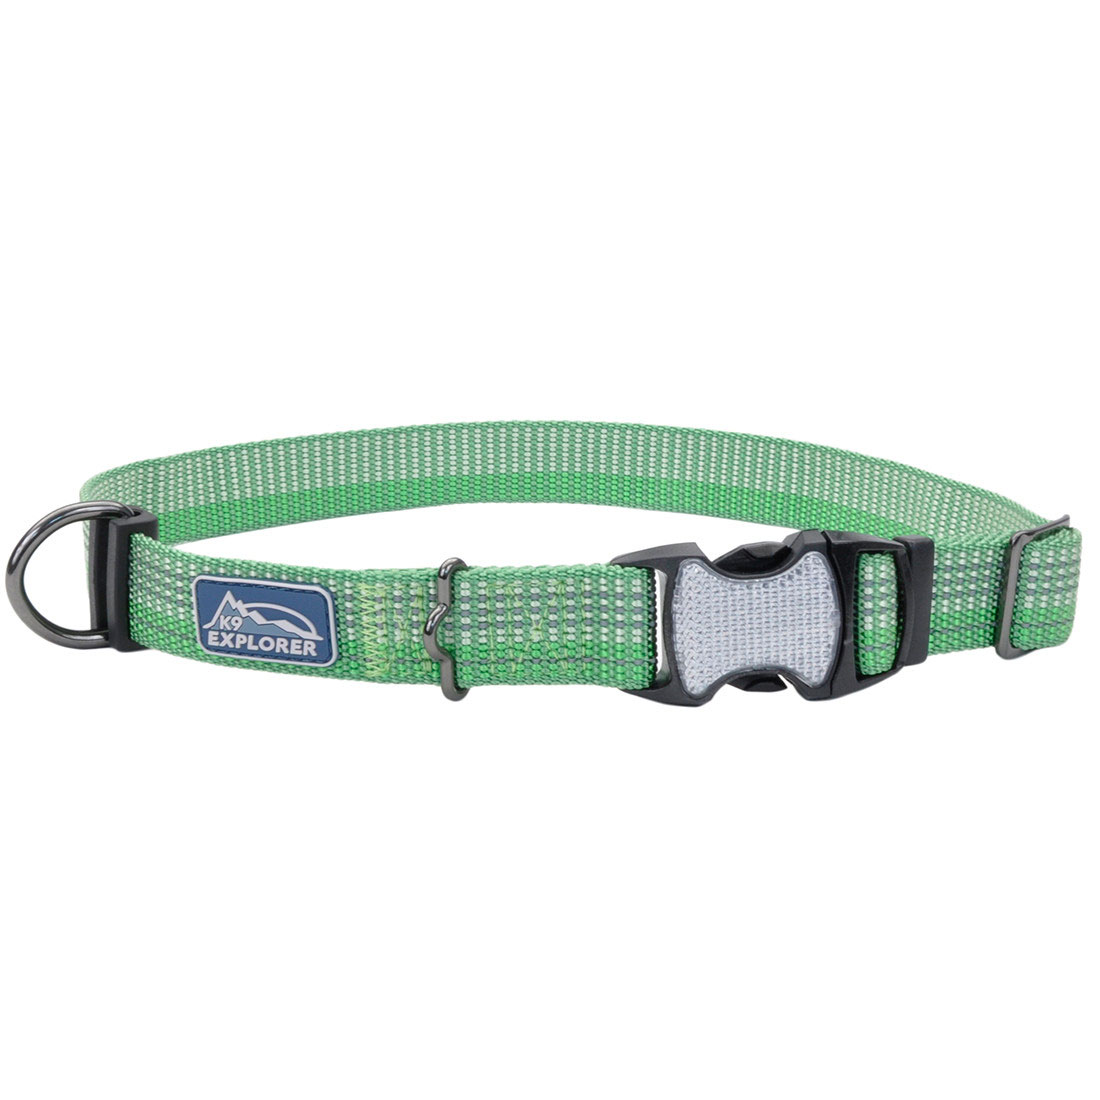 Coastal Pet Products 36432 MDW12